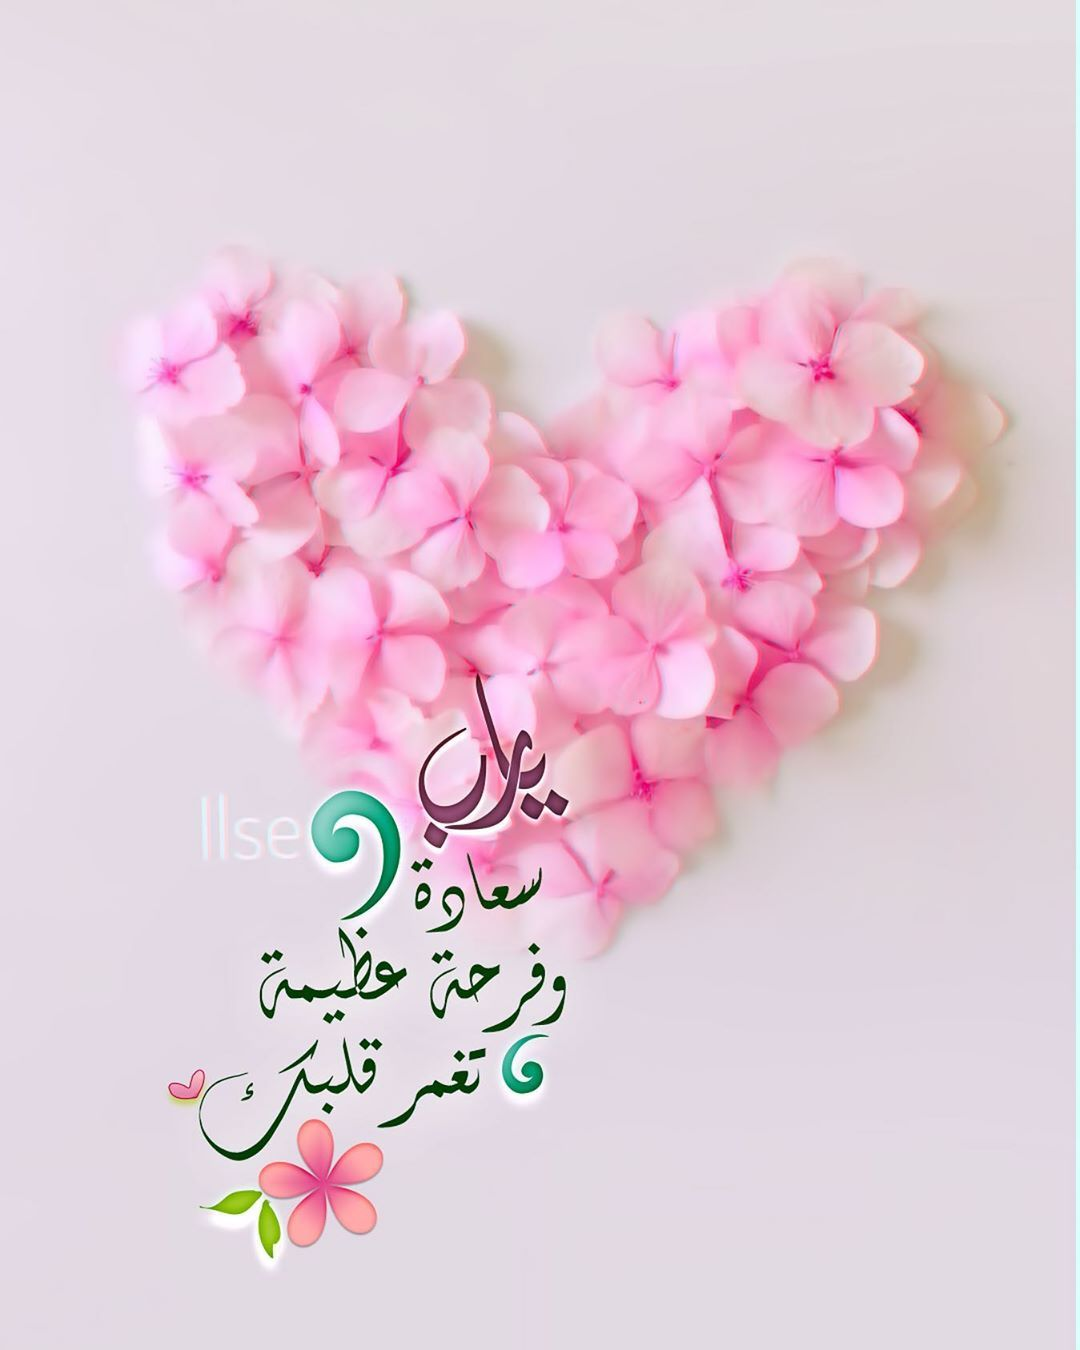 Pearla0203 On Instagram يارب س عادة وف رحة عظيم ة ت غمر قلبك ㅤㅤㅤㅤㅤㅤ ㅤㅤㅤㅤㅤㅤ Flower Iphone Wallpaper Islamic Art Pattern Beautiful Rose Flowers